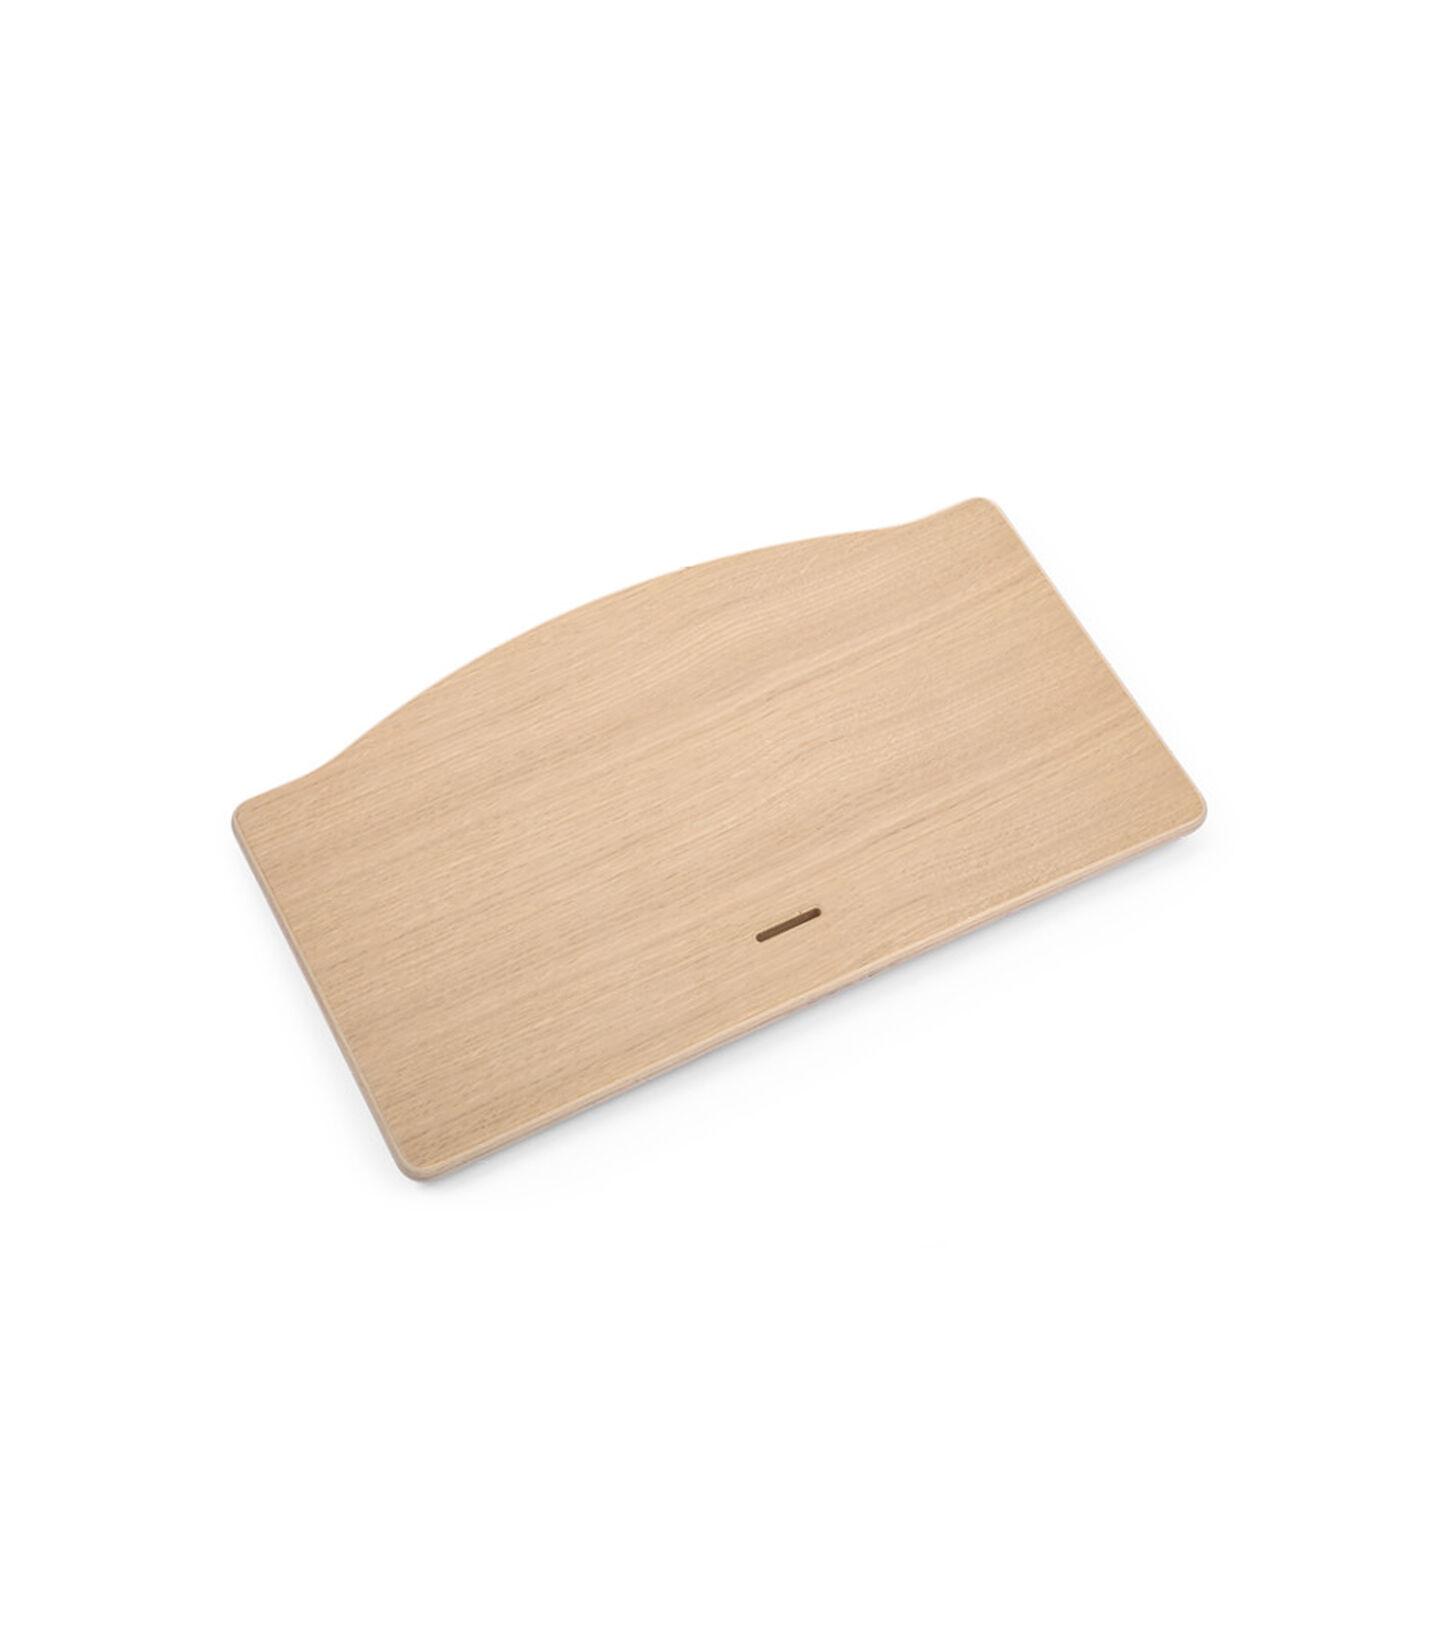 Tripp Trapp® Seatplate Oak White, Oak Natural, mainview view 2